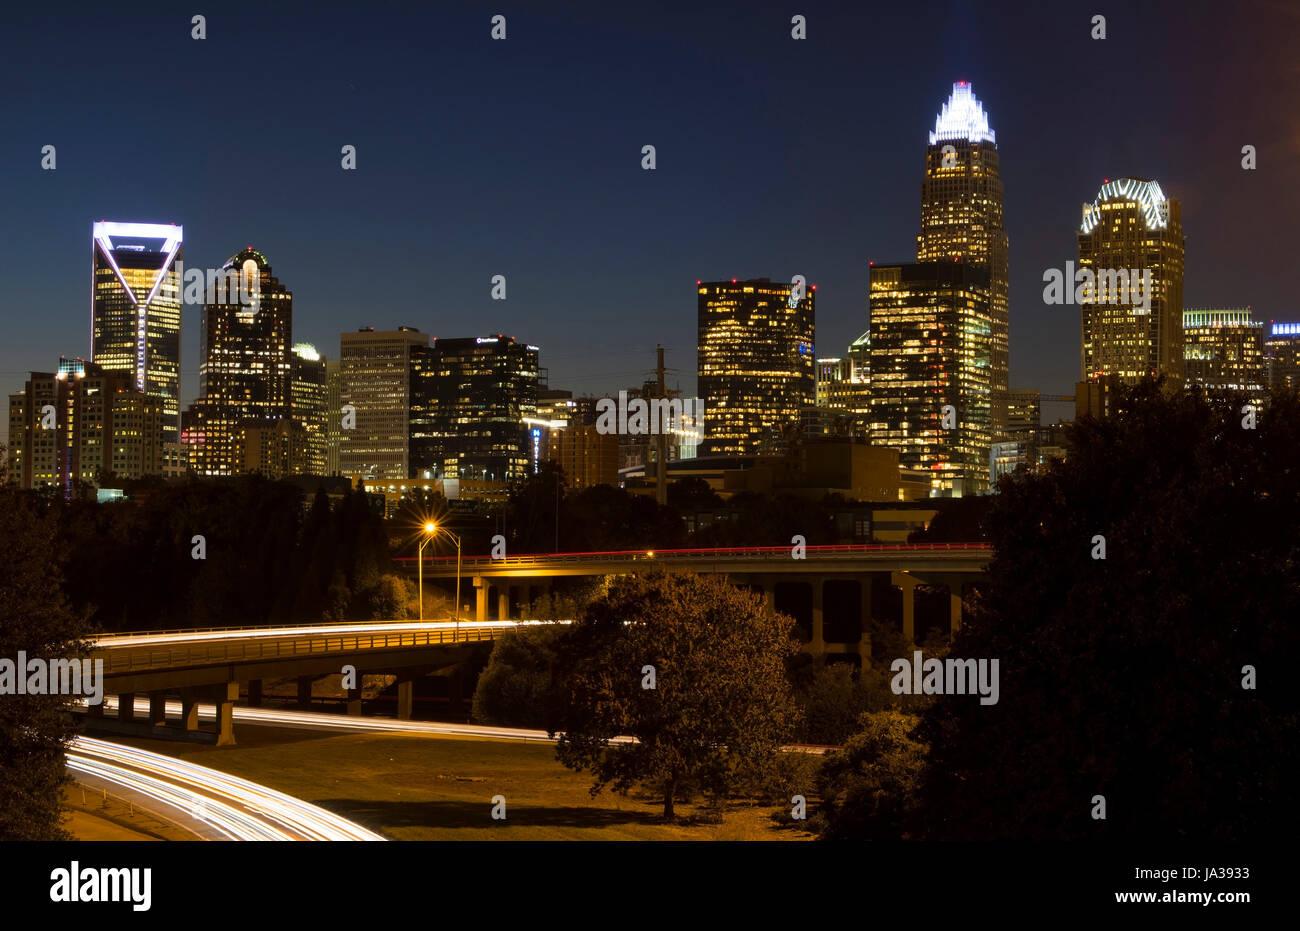 Charlotte North Carolina skyline at night avec circulation brouille et crépuscule Banque D'Images